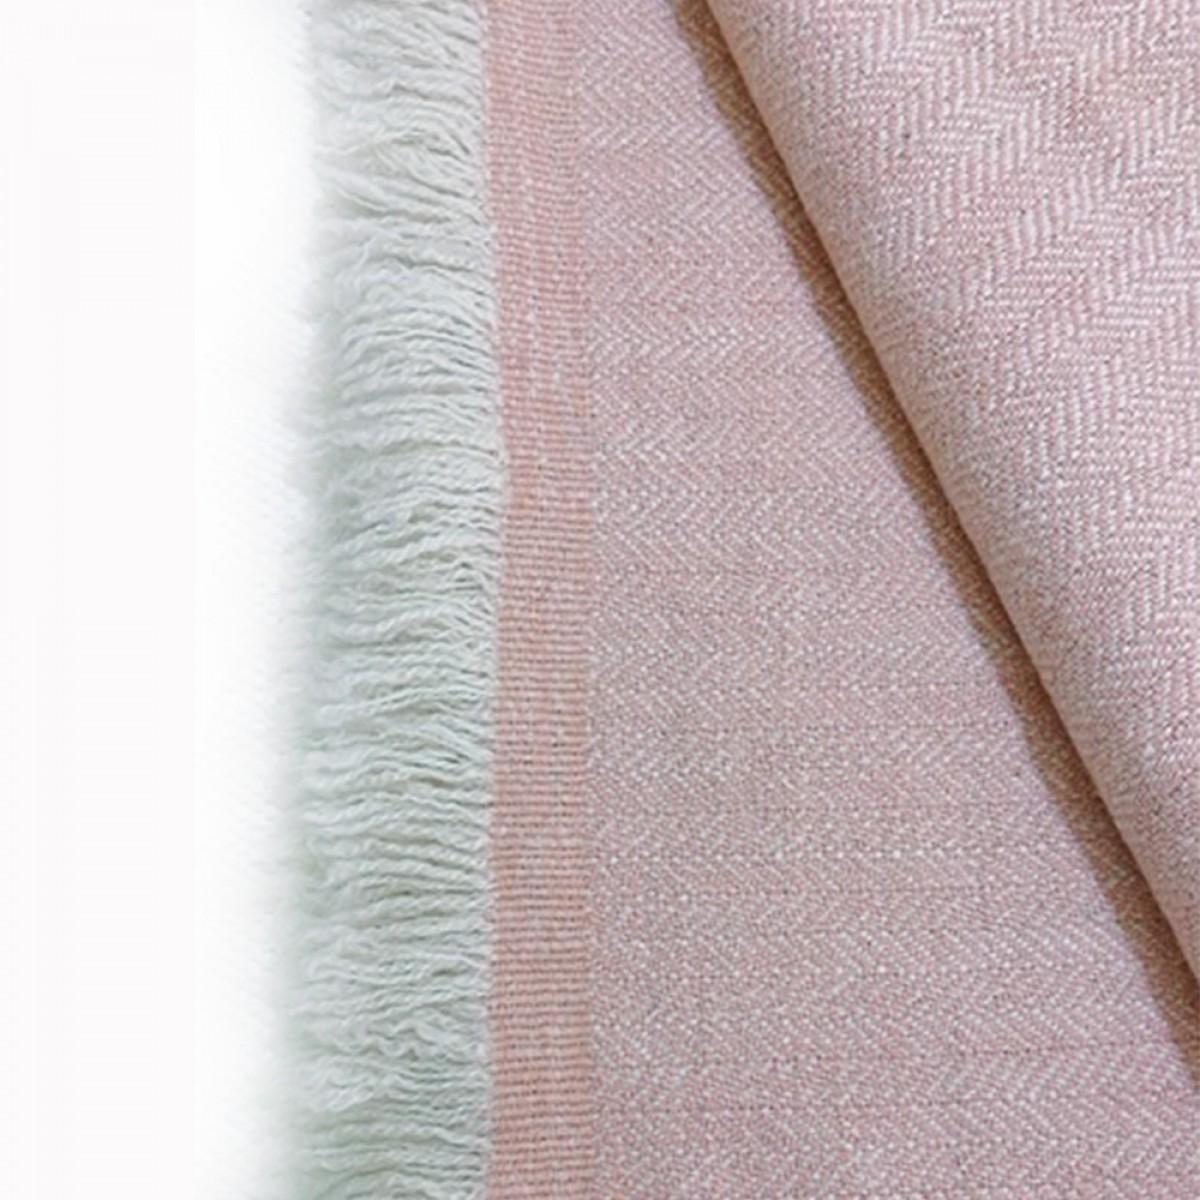 Peach Herringbone Weave Baby Cashmere Blanket